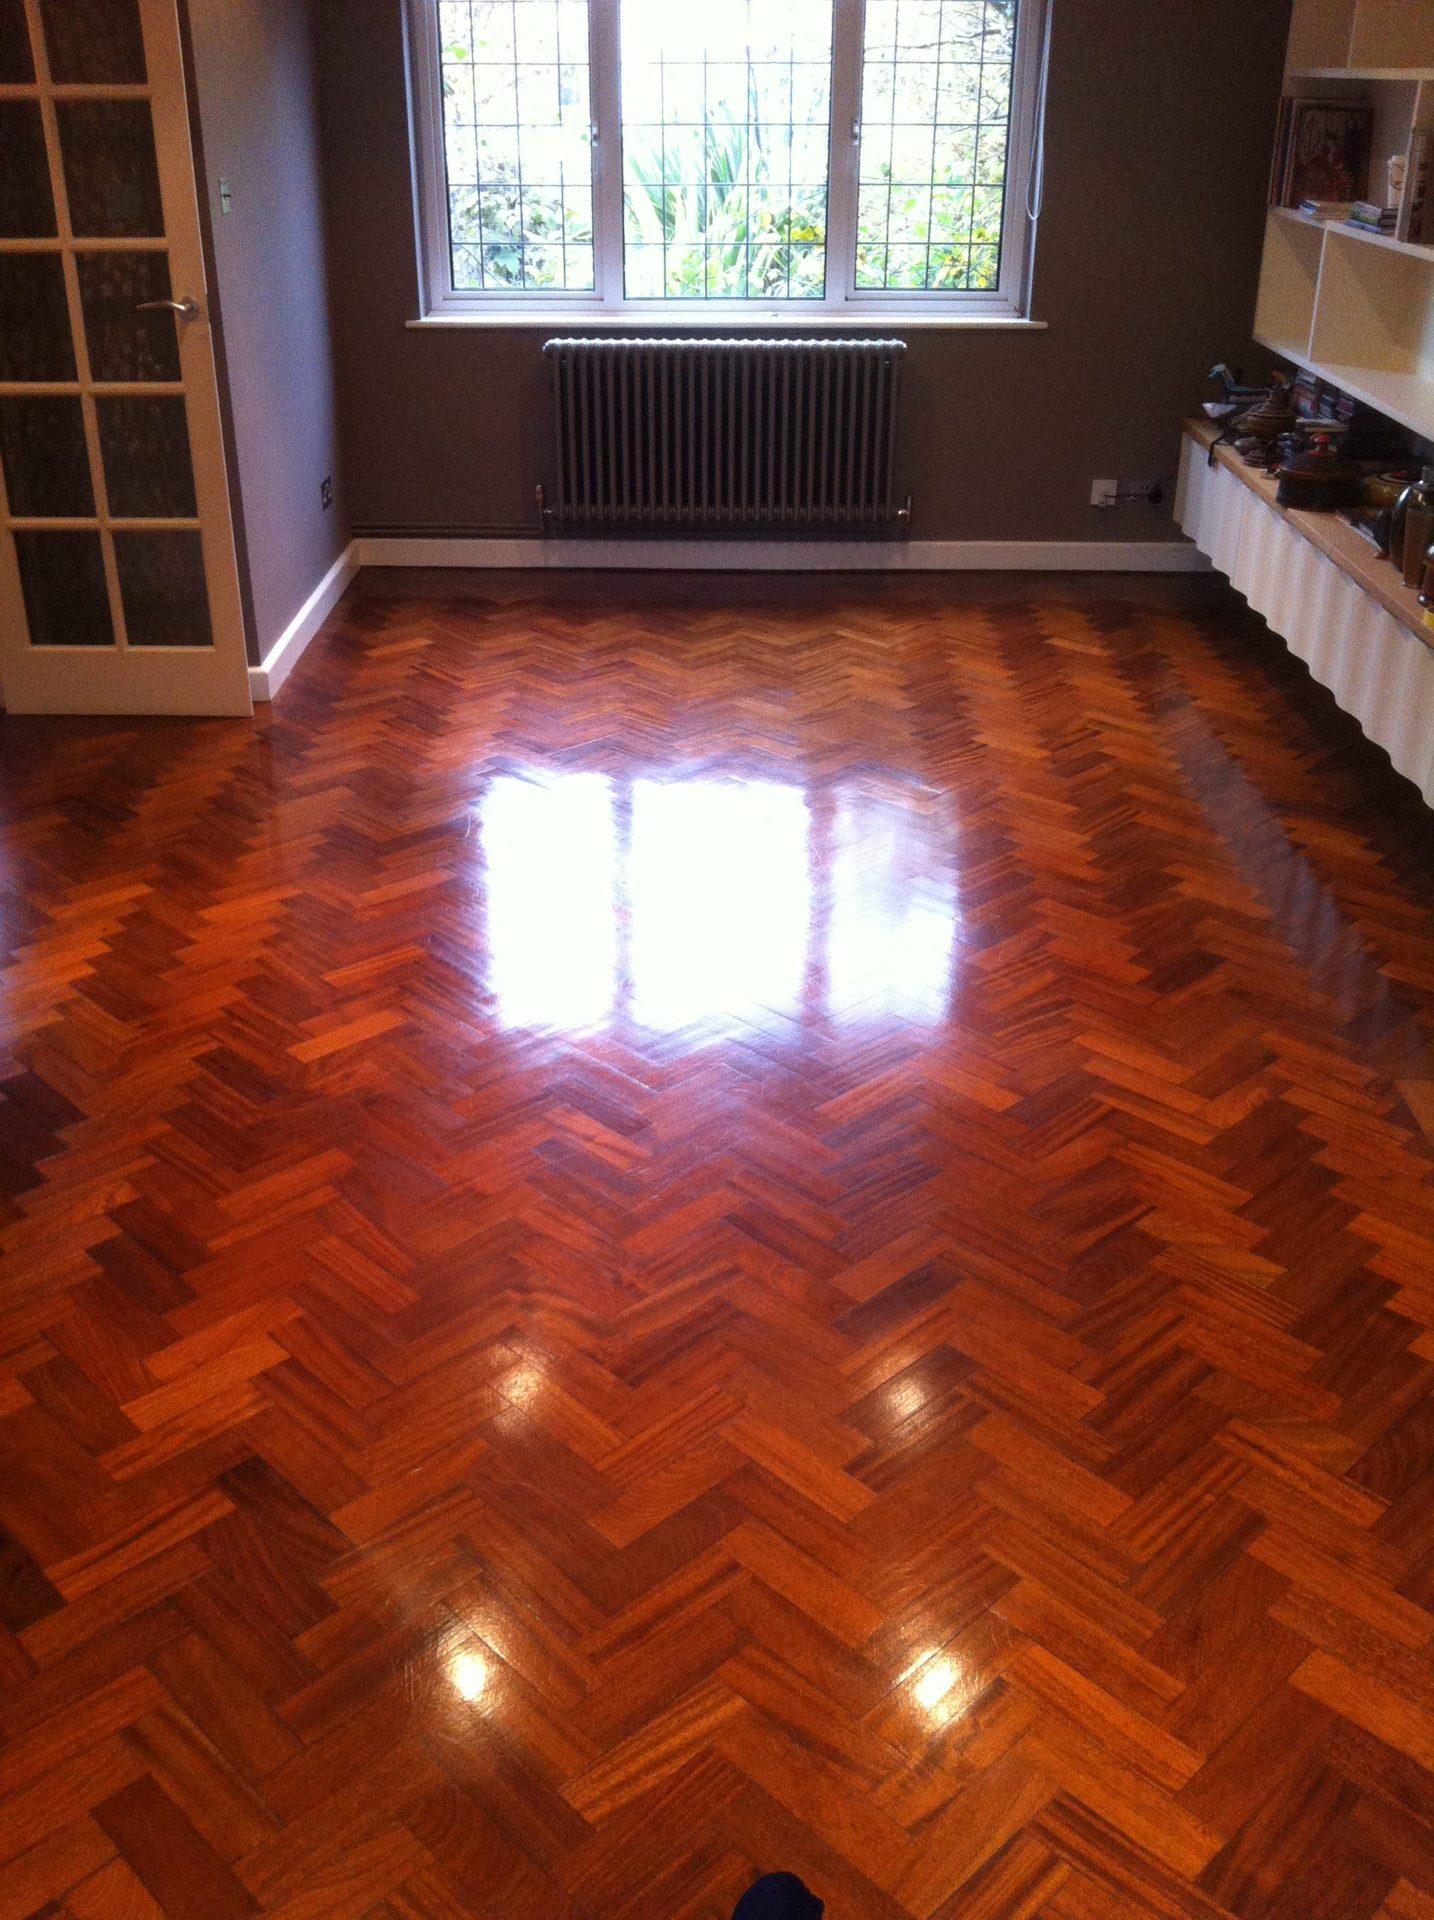 Wood floor cleaning waxing polishing brighton east for Wood floor maintenance